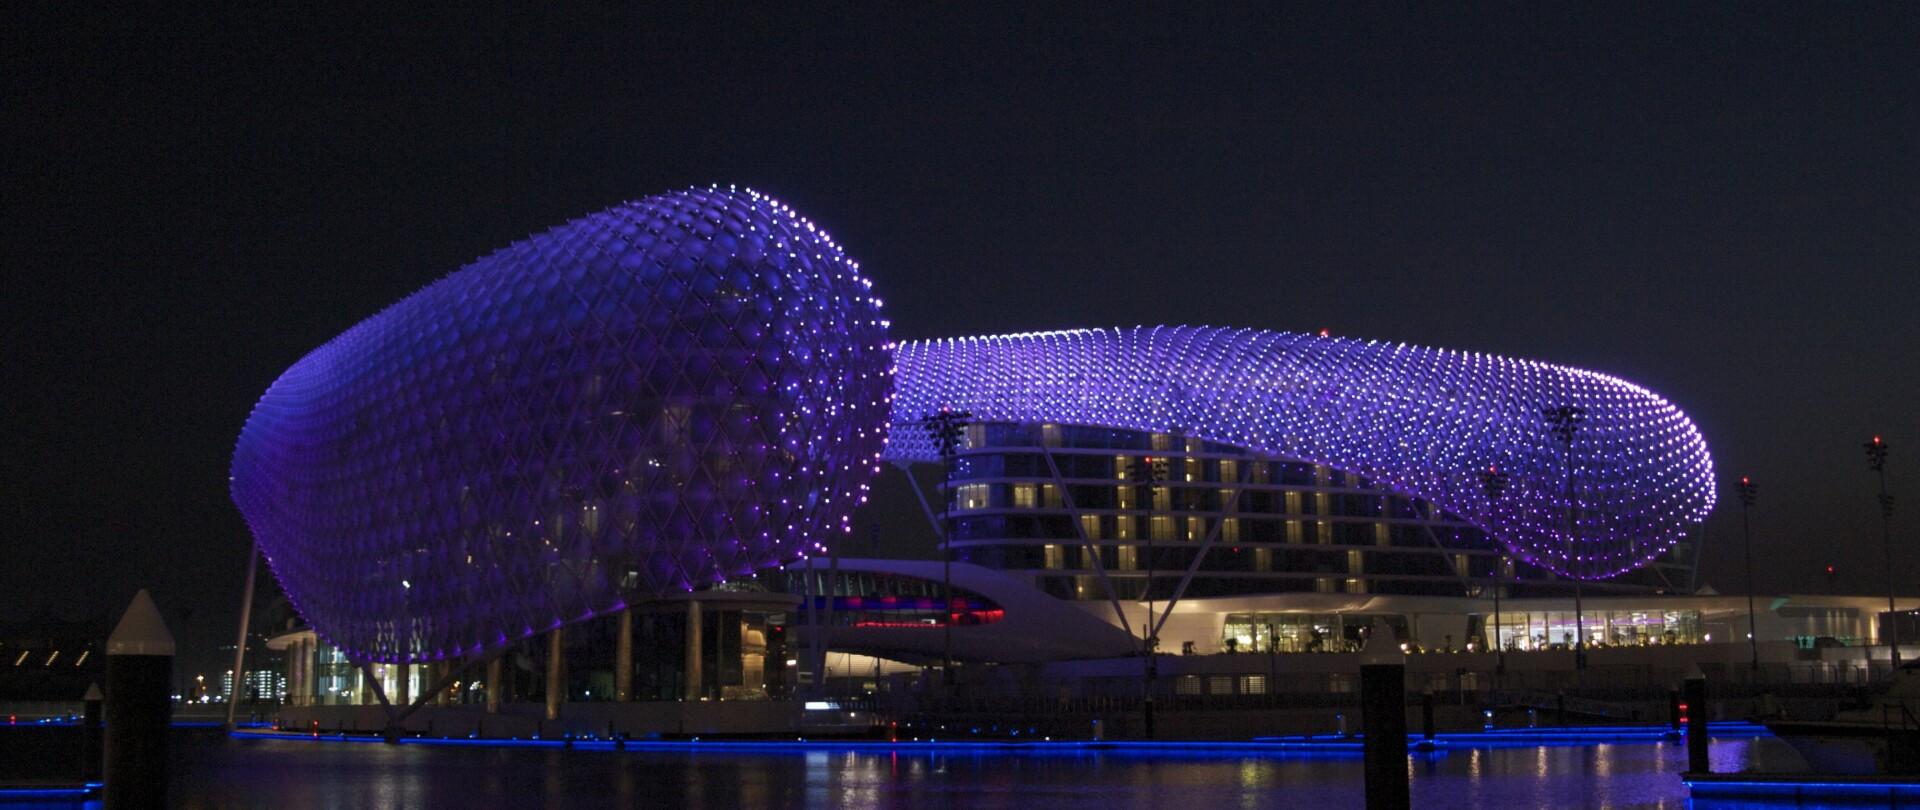 SHELEILA - Abu Dhabi Grand Prix photo 3